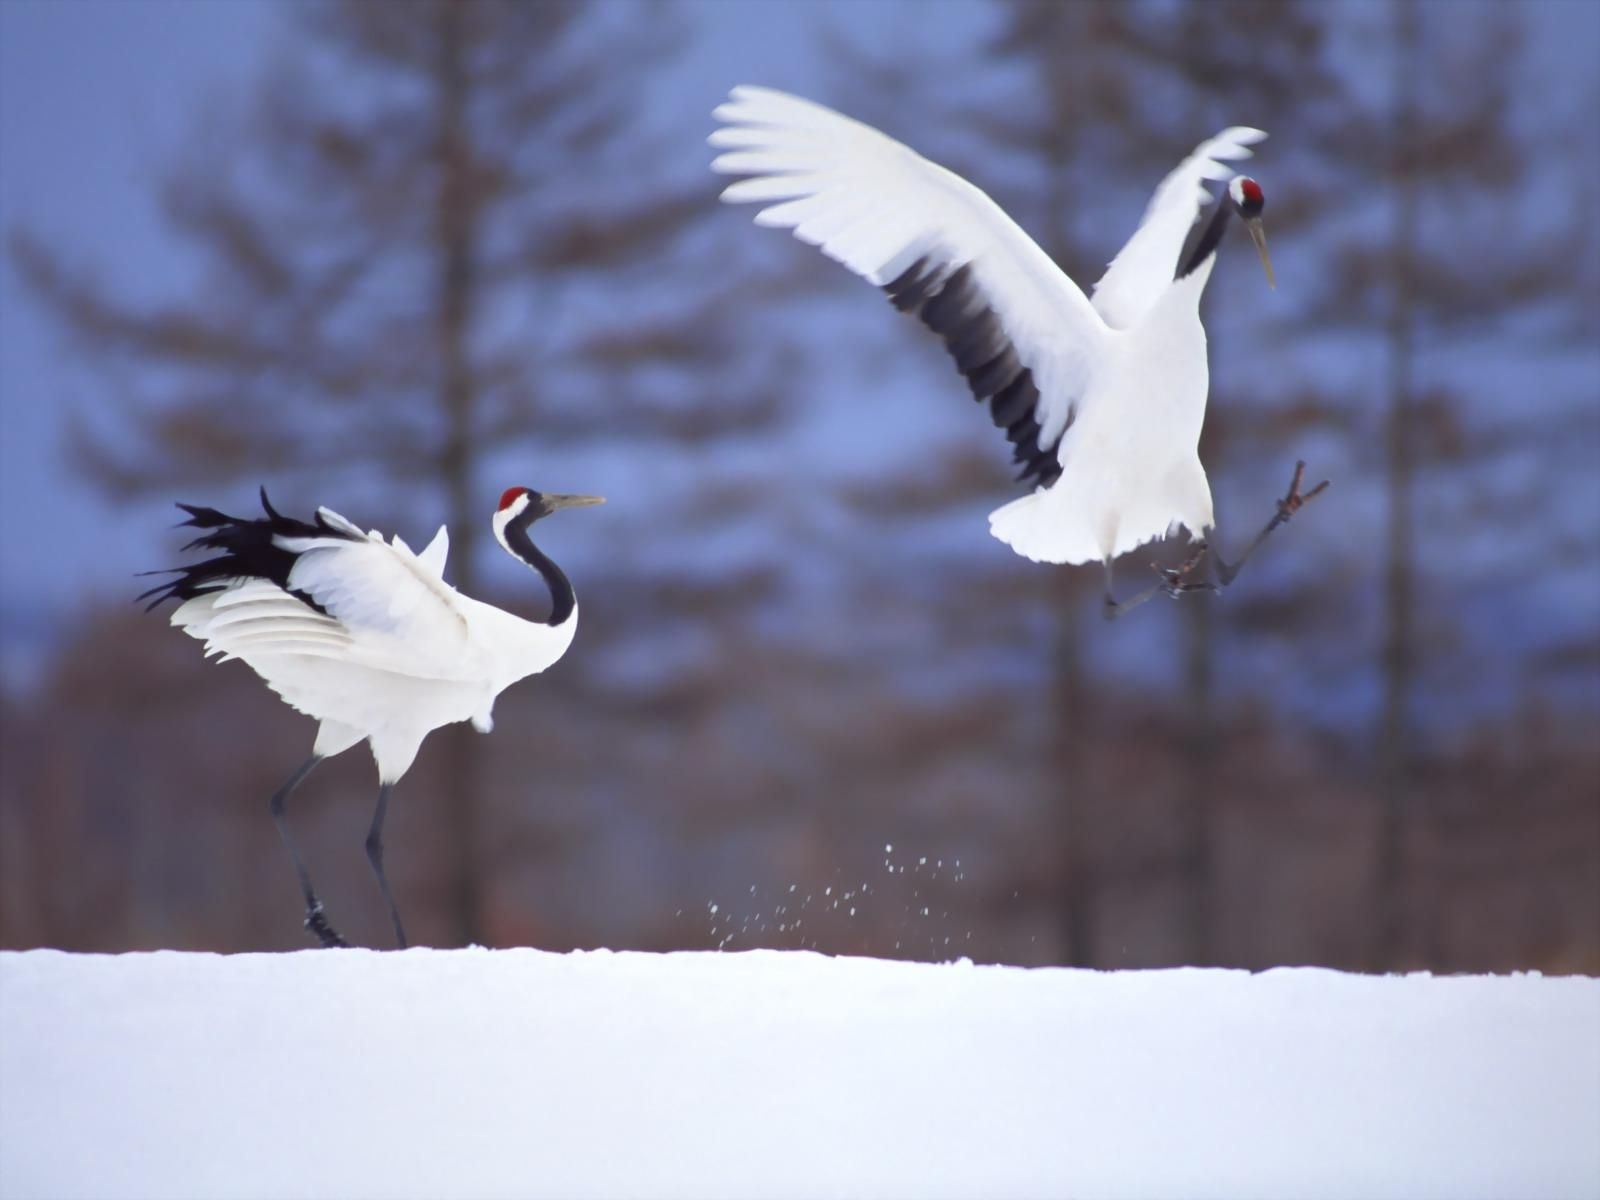 Japanese Crane On Snow Wallpaper 1600x1200